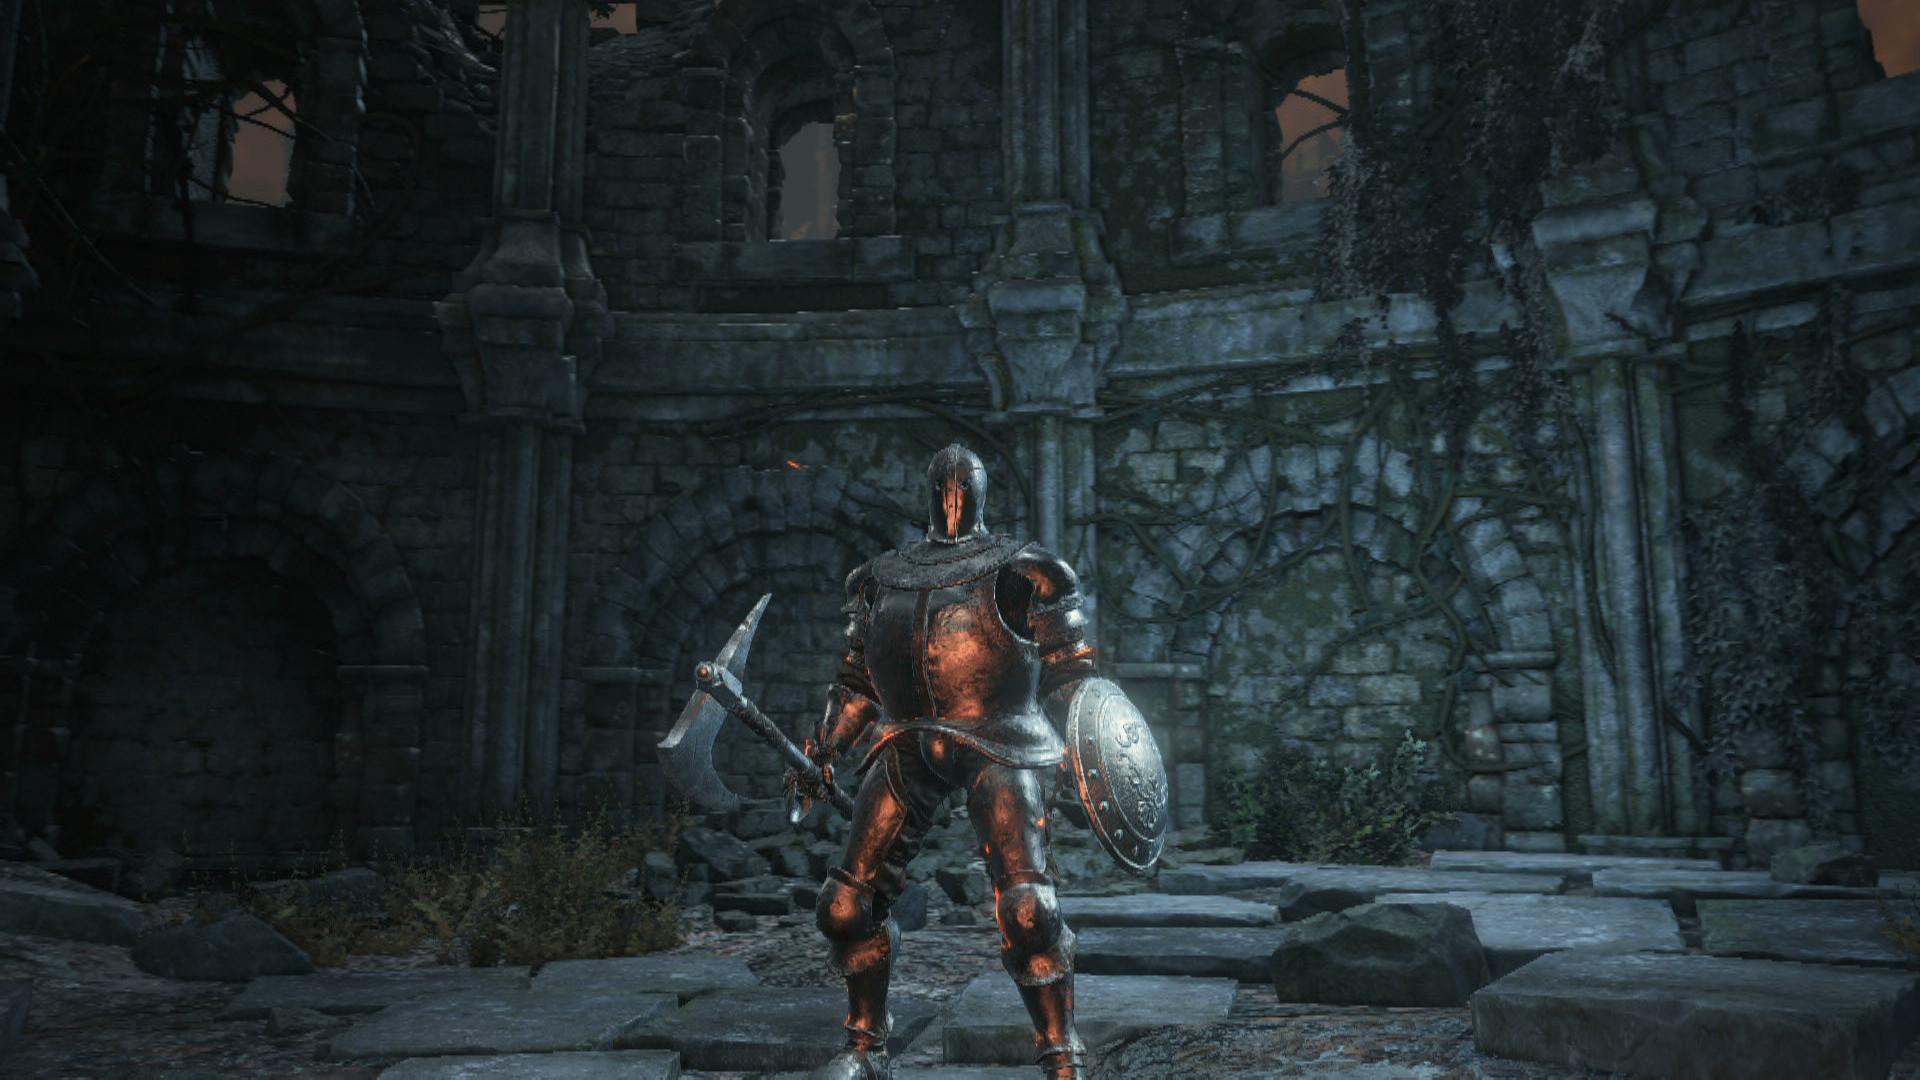 ArtStation - Dark Souls III - Horace the Hushed, Yin Ning Lim